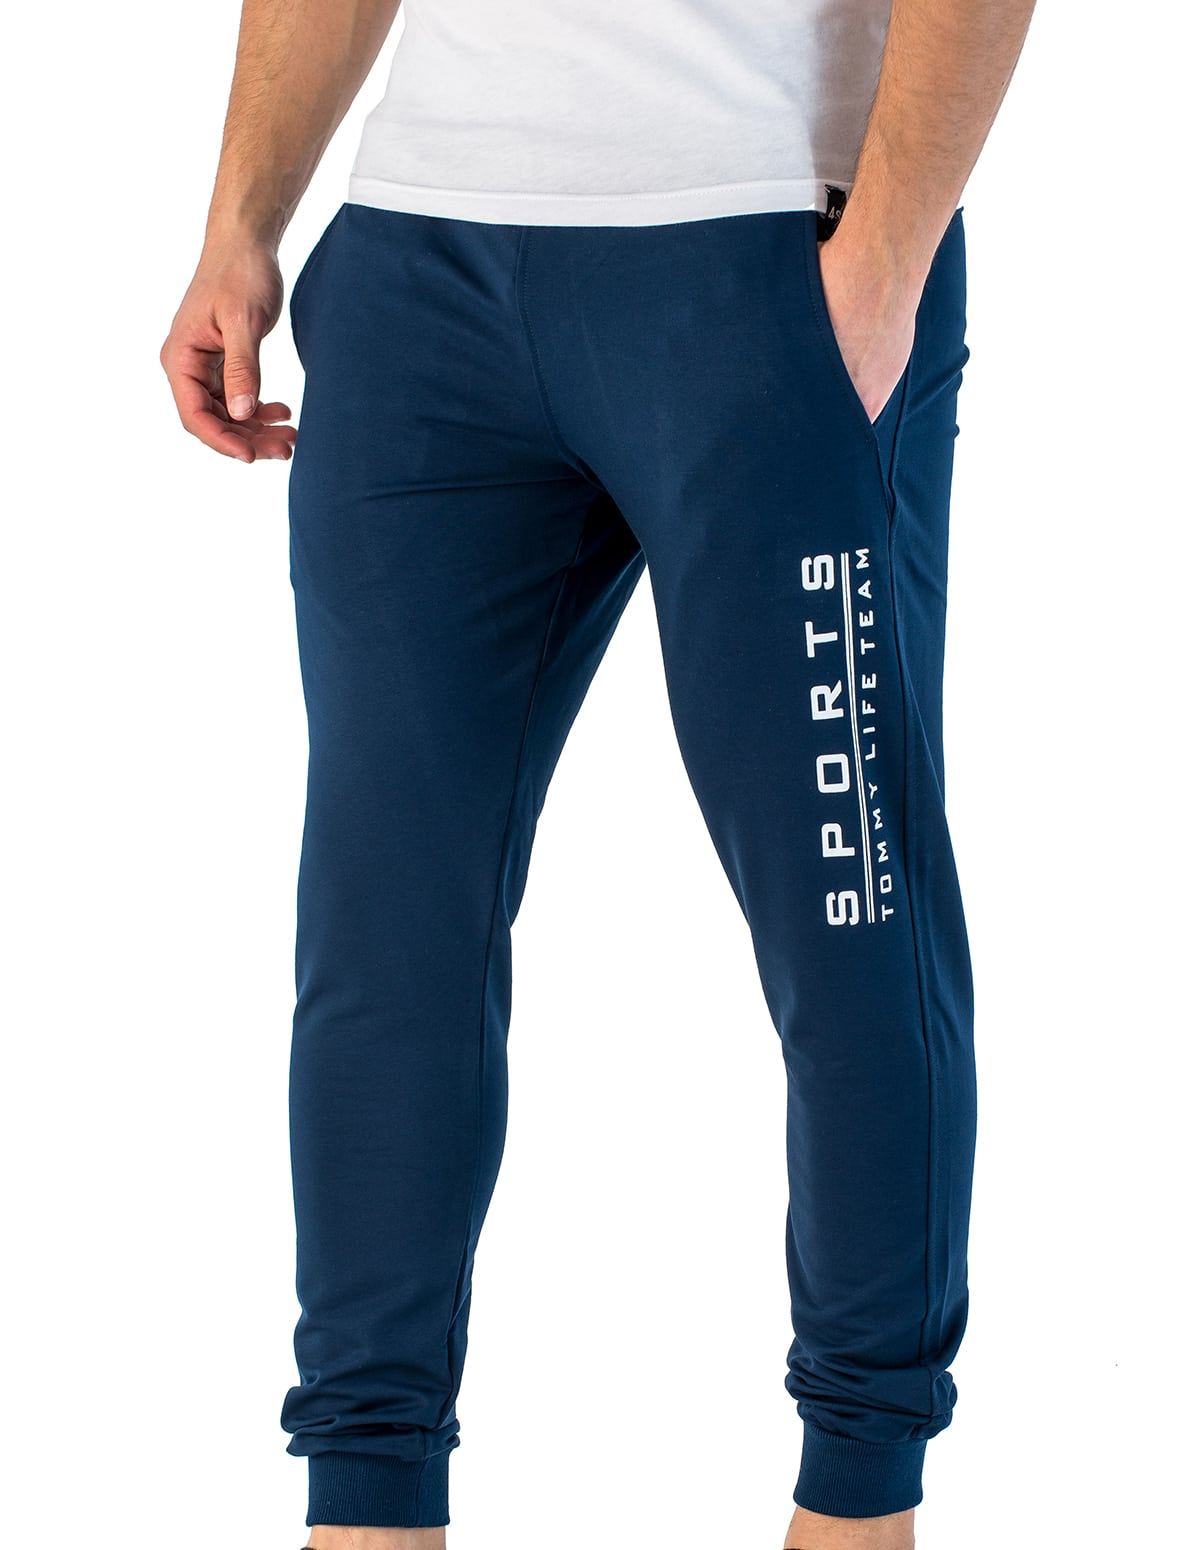 1b98f283277 Ανδρικό παντελόνι φόρμας jogger σε μπλε χρώμα - vactive.gr